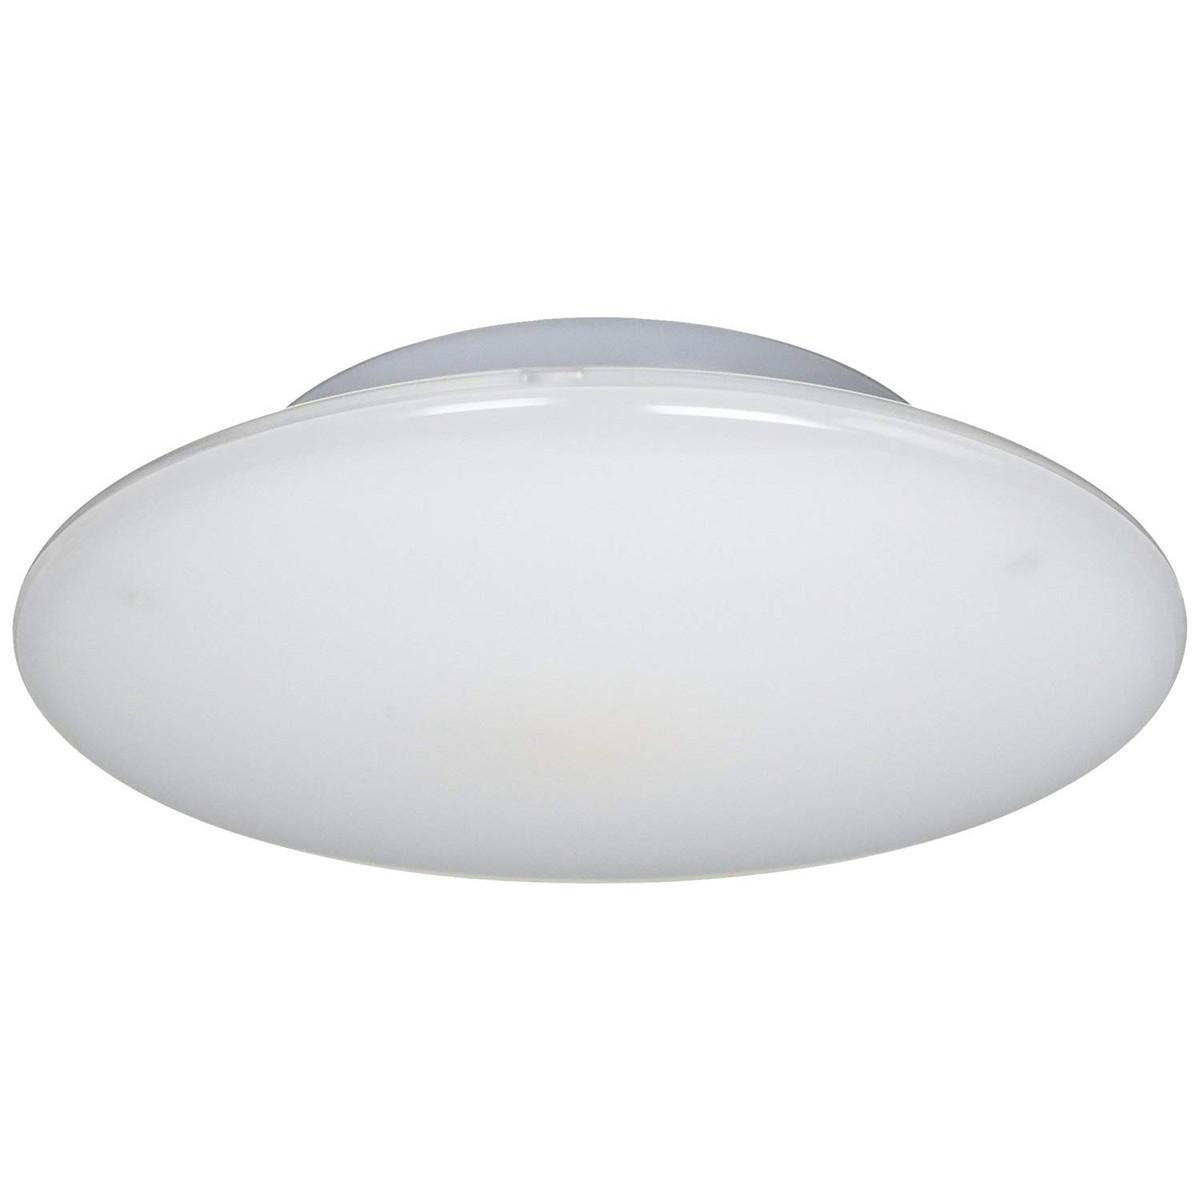 Slimac スワン電器 LEDミニシーリングライト 電球色LEDタイプ CE-41【クーポン配布中】